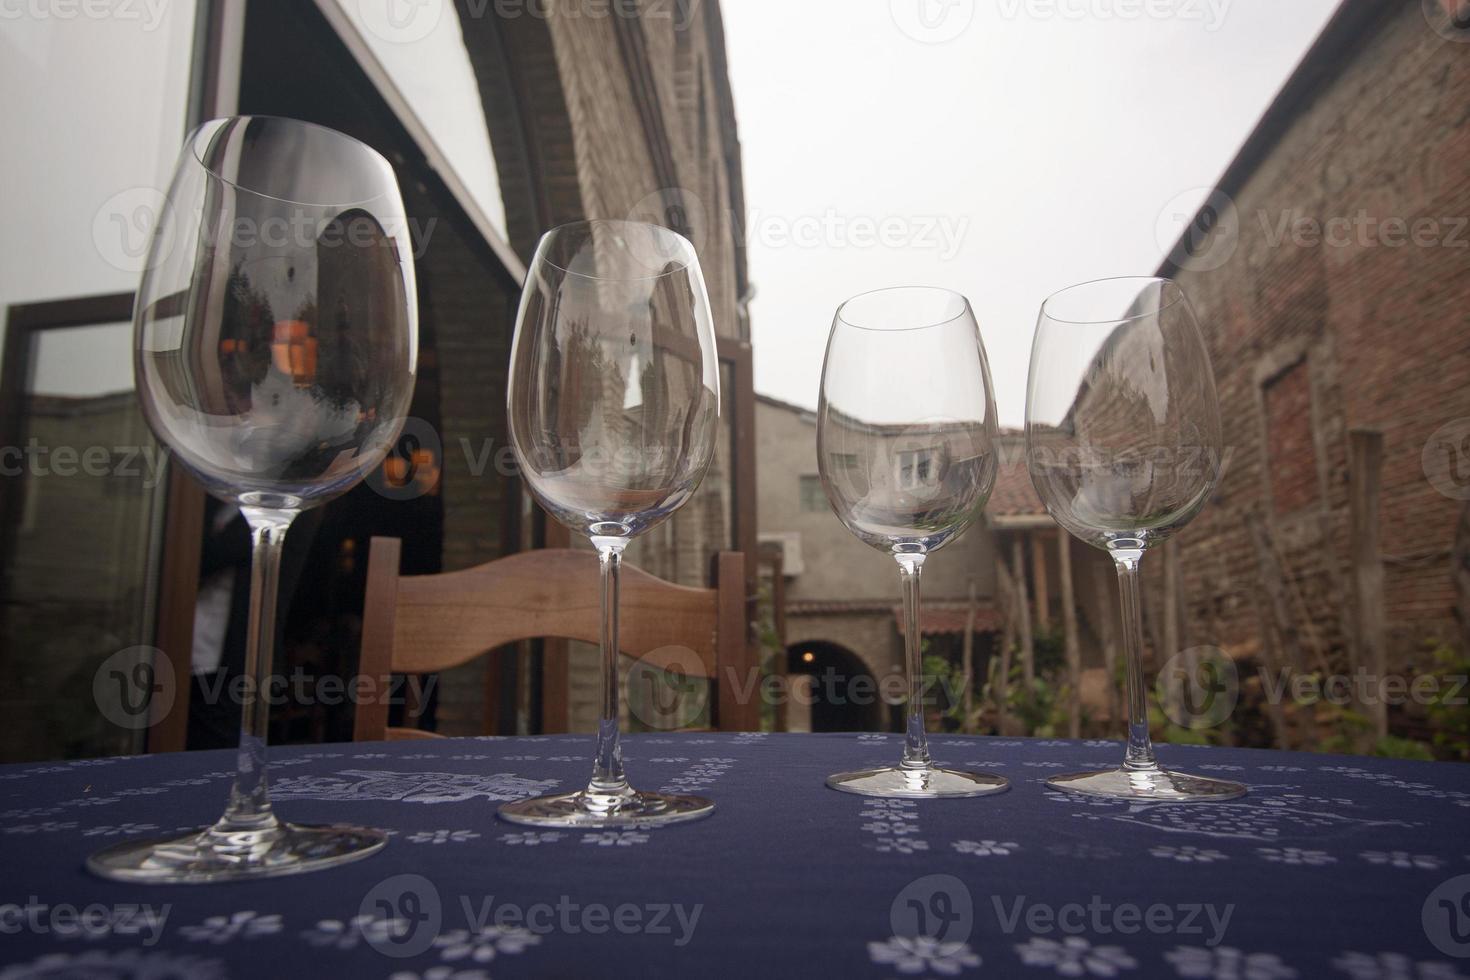 las copas de vino. foto